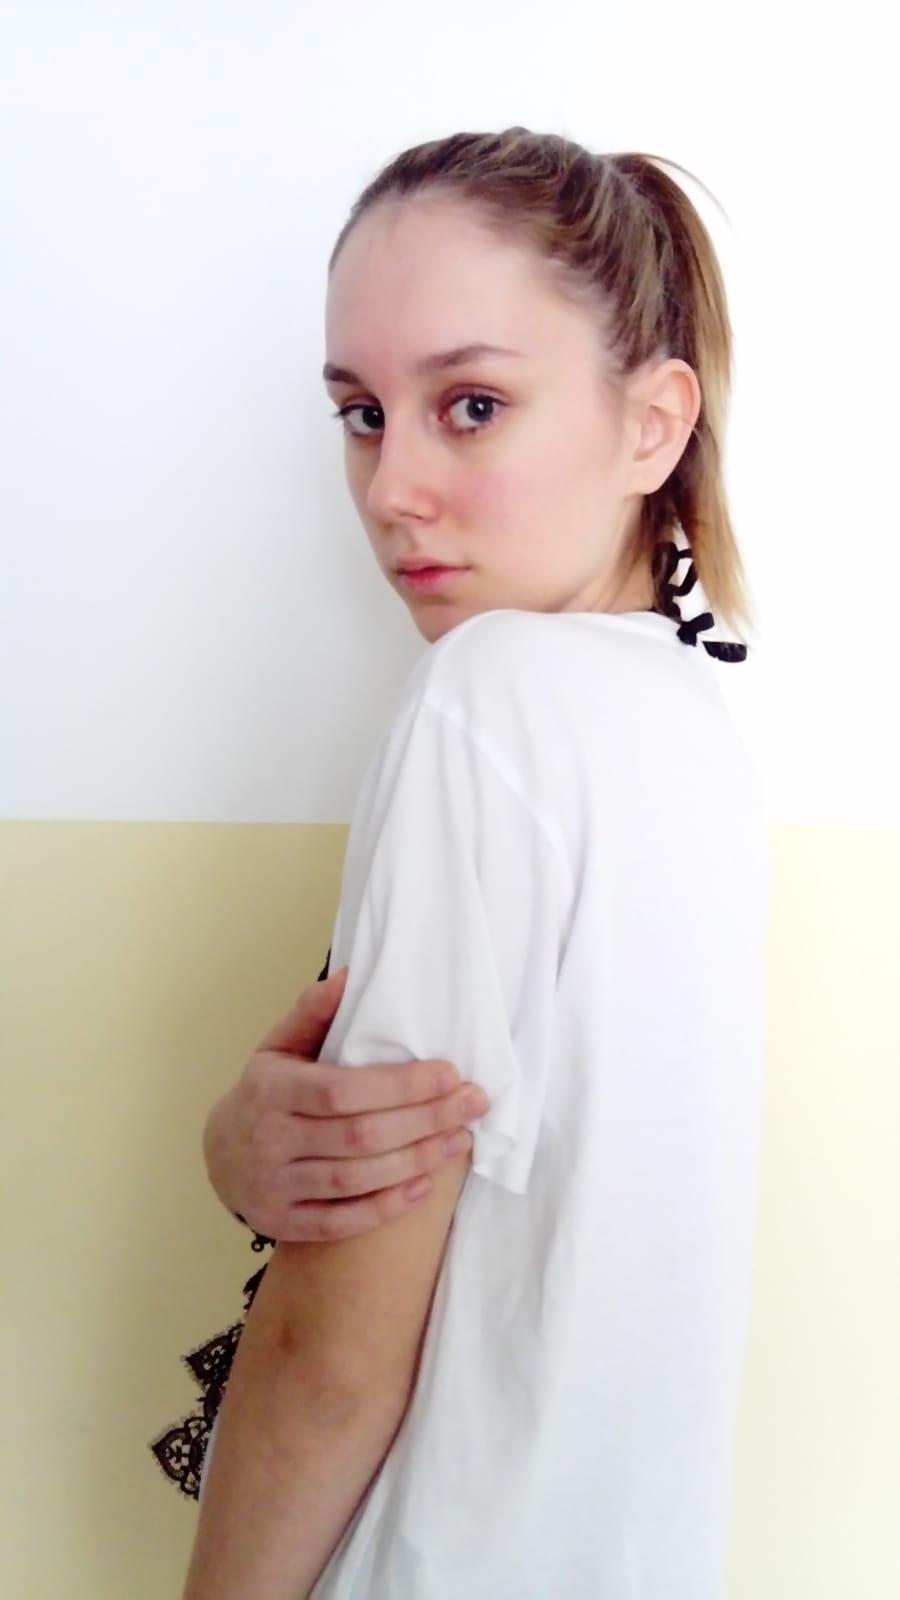 KARLA Penić Ivanko